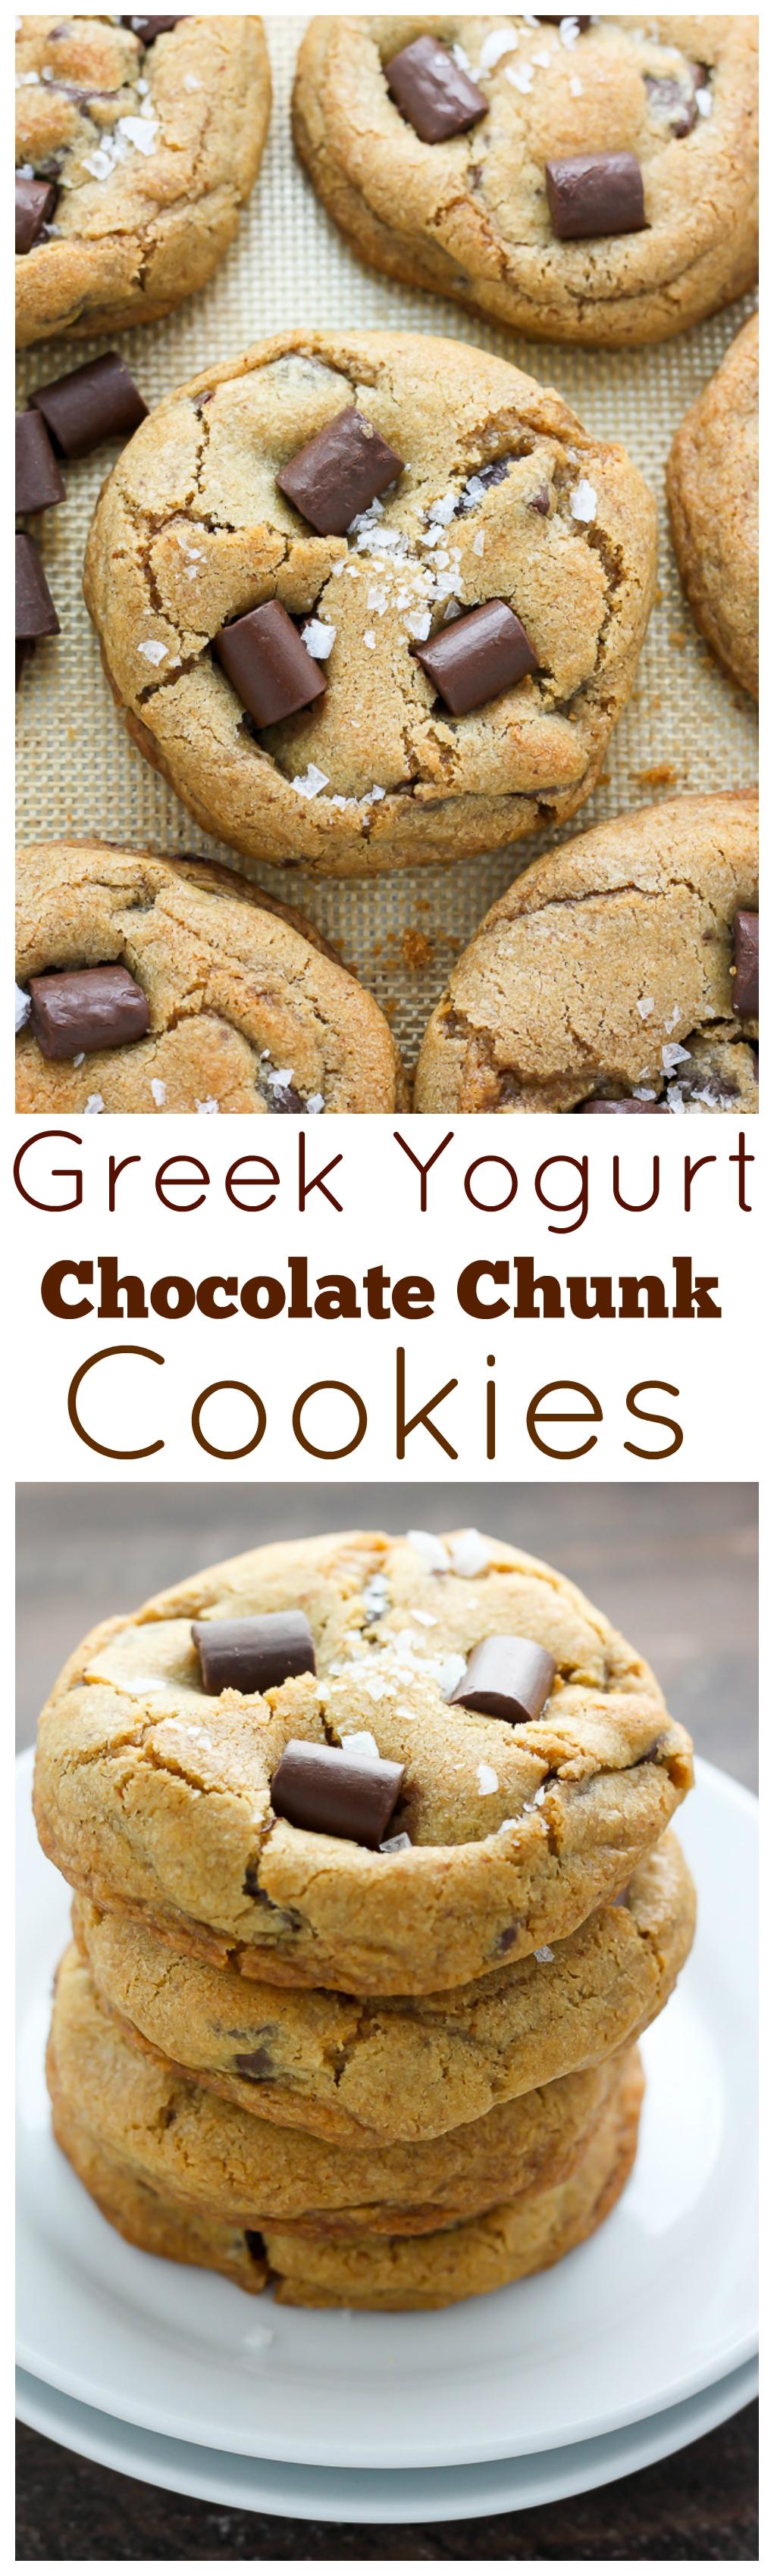 Greek Yogurt Chocolate Chunk Cookies - Baker by Nature